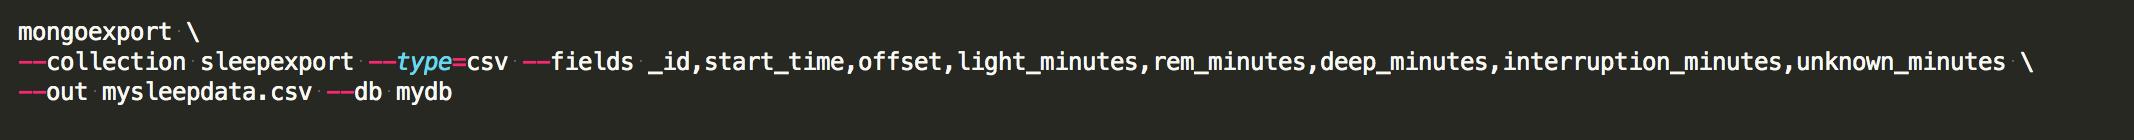 MongoDB export query